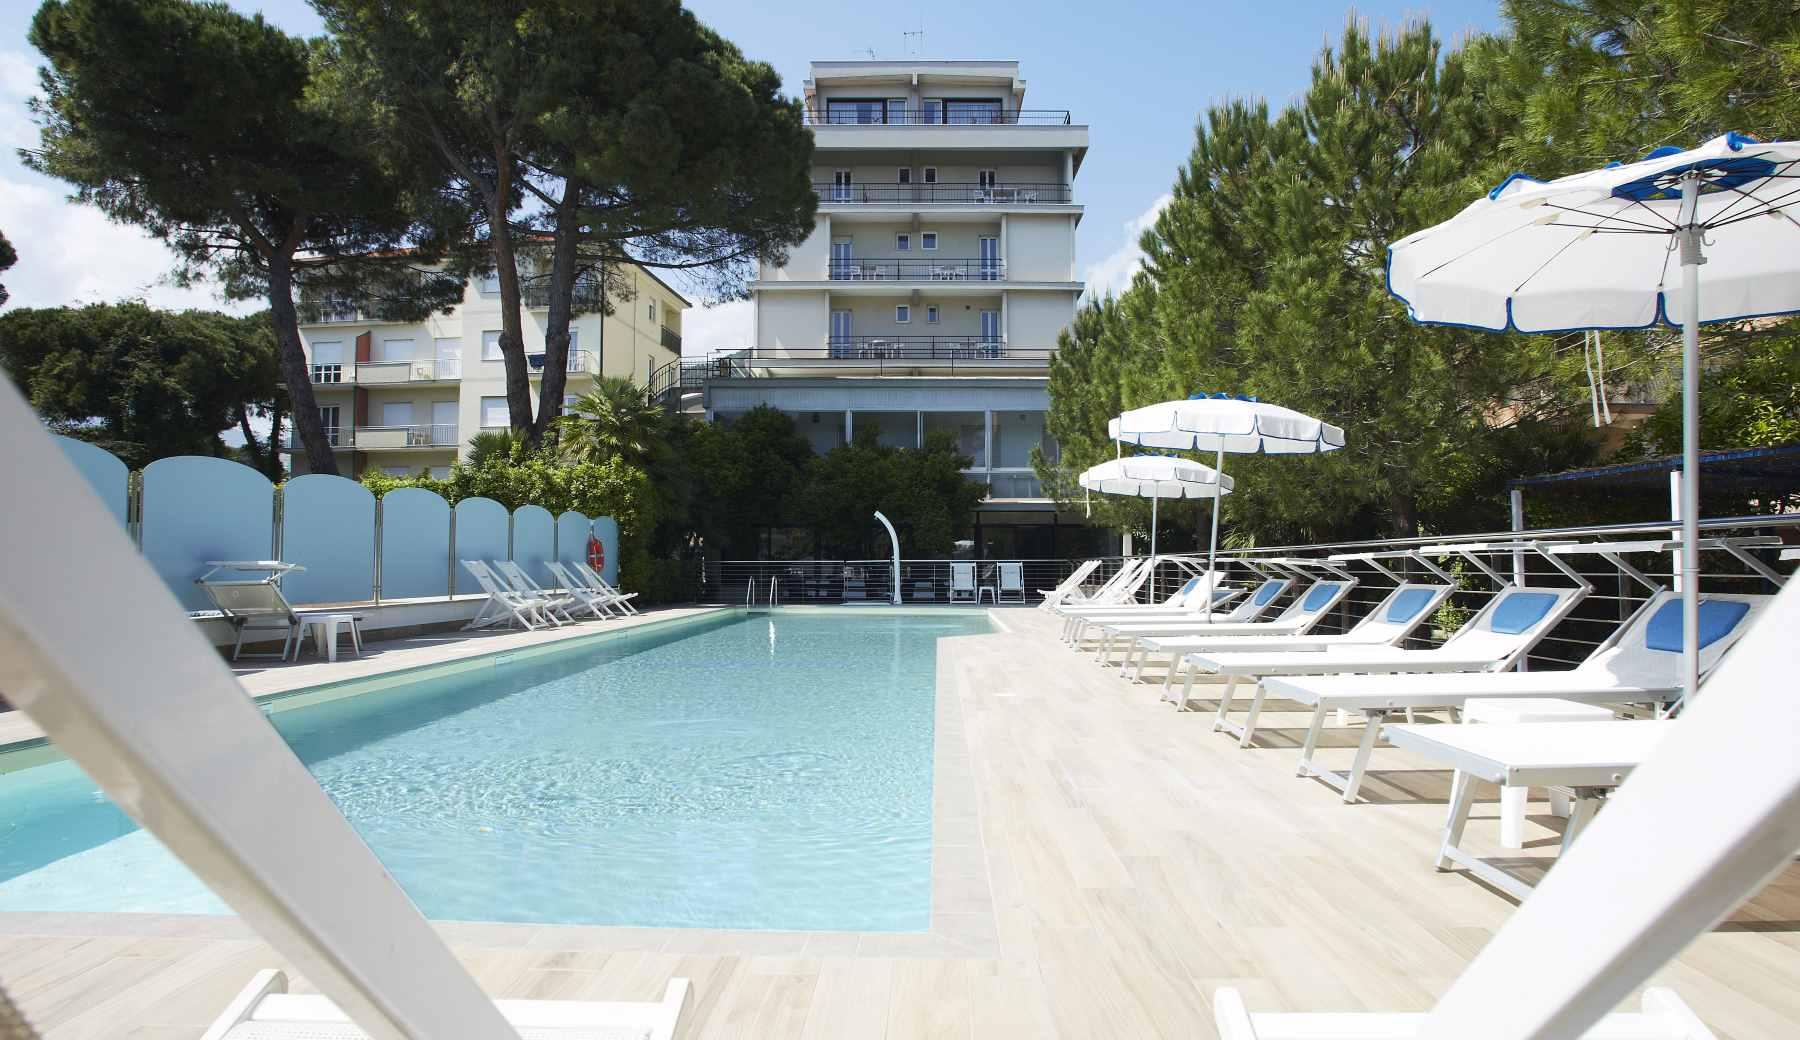 In vacanza in liguria con i bambini i residence its4kids - Residence marzamemi con piscina ...